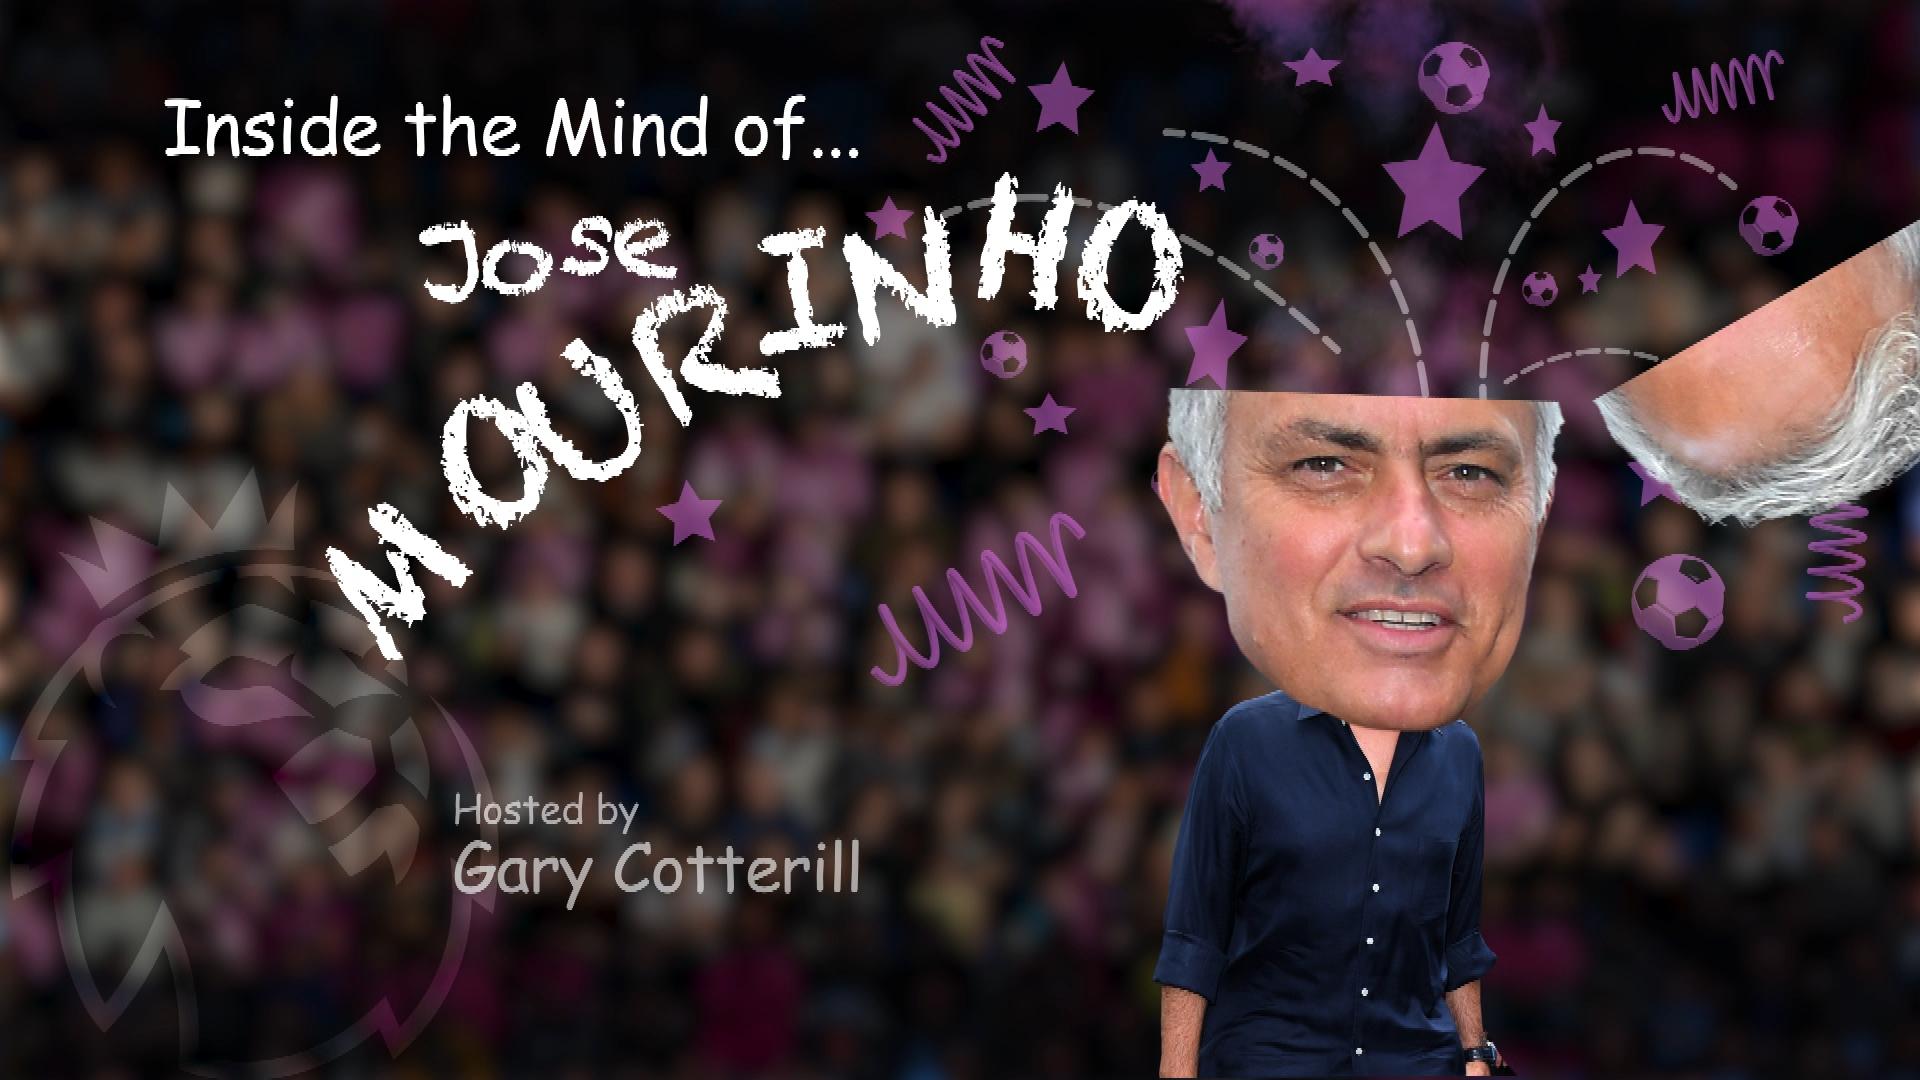 Inside the Mind of Jose Mourinho: On childhood, career beginnings,